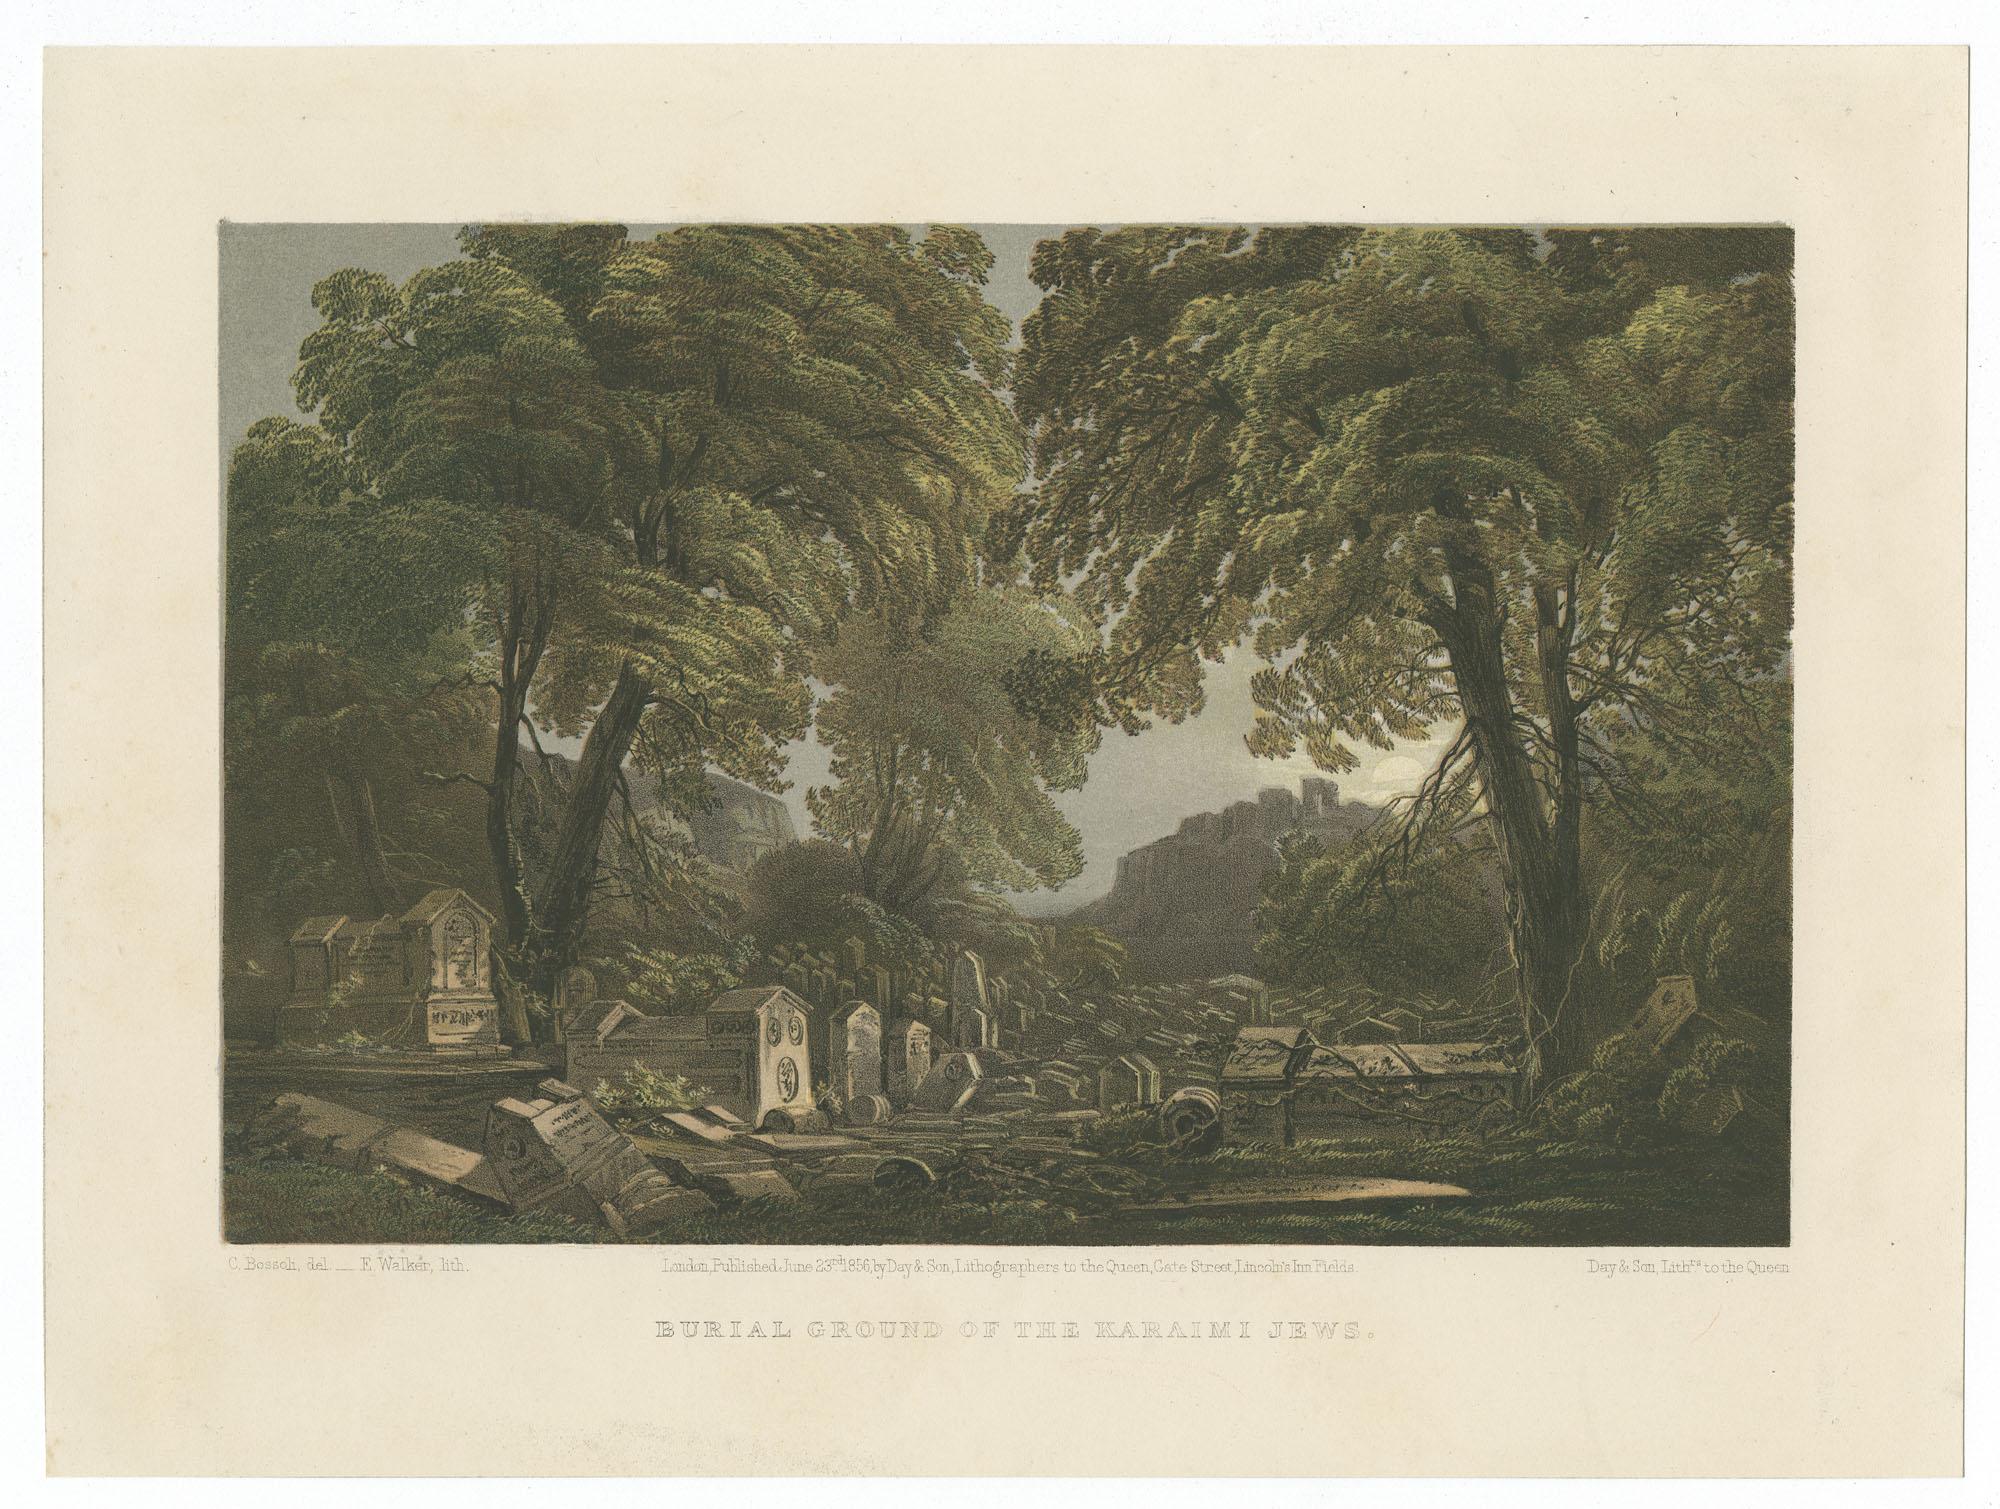 Burial ground of the Karaimi Jews